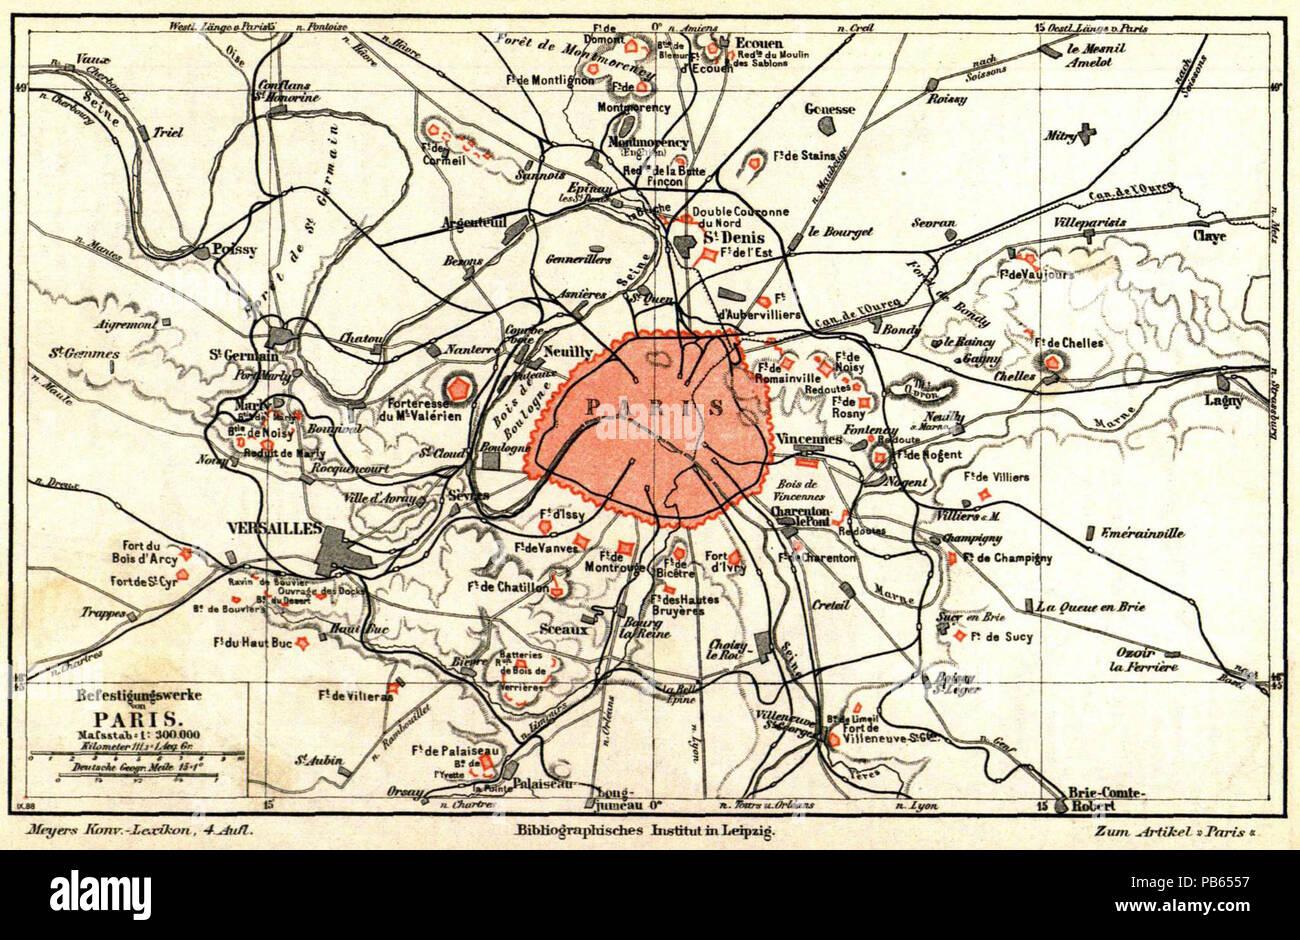 Karte Paris.Paris 1890 Karte Stock Photos Paris 1890 Karte Stock Images Alamy